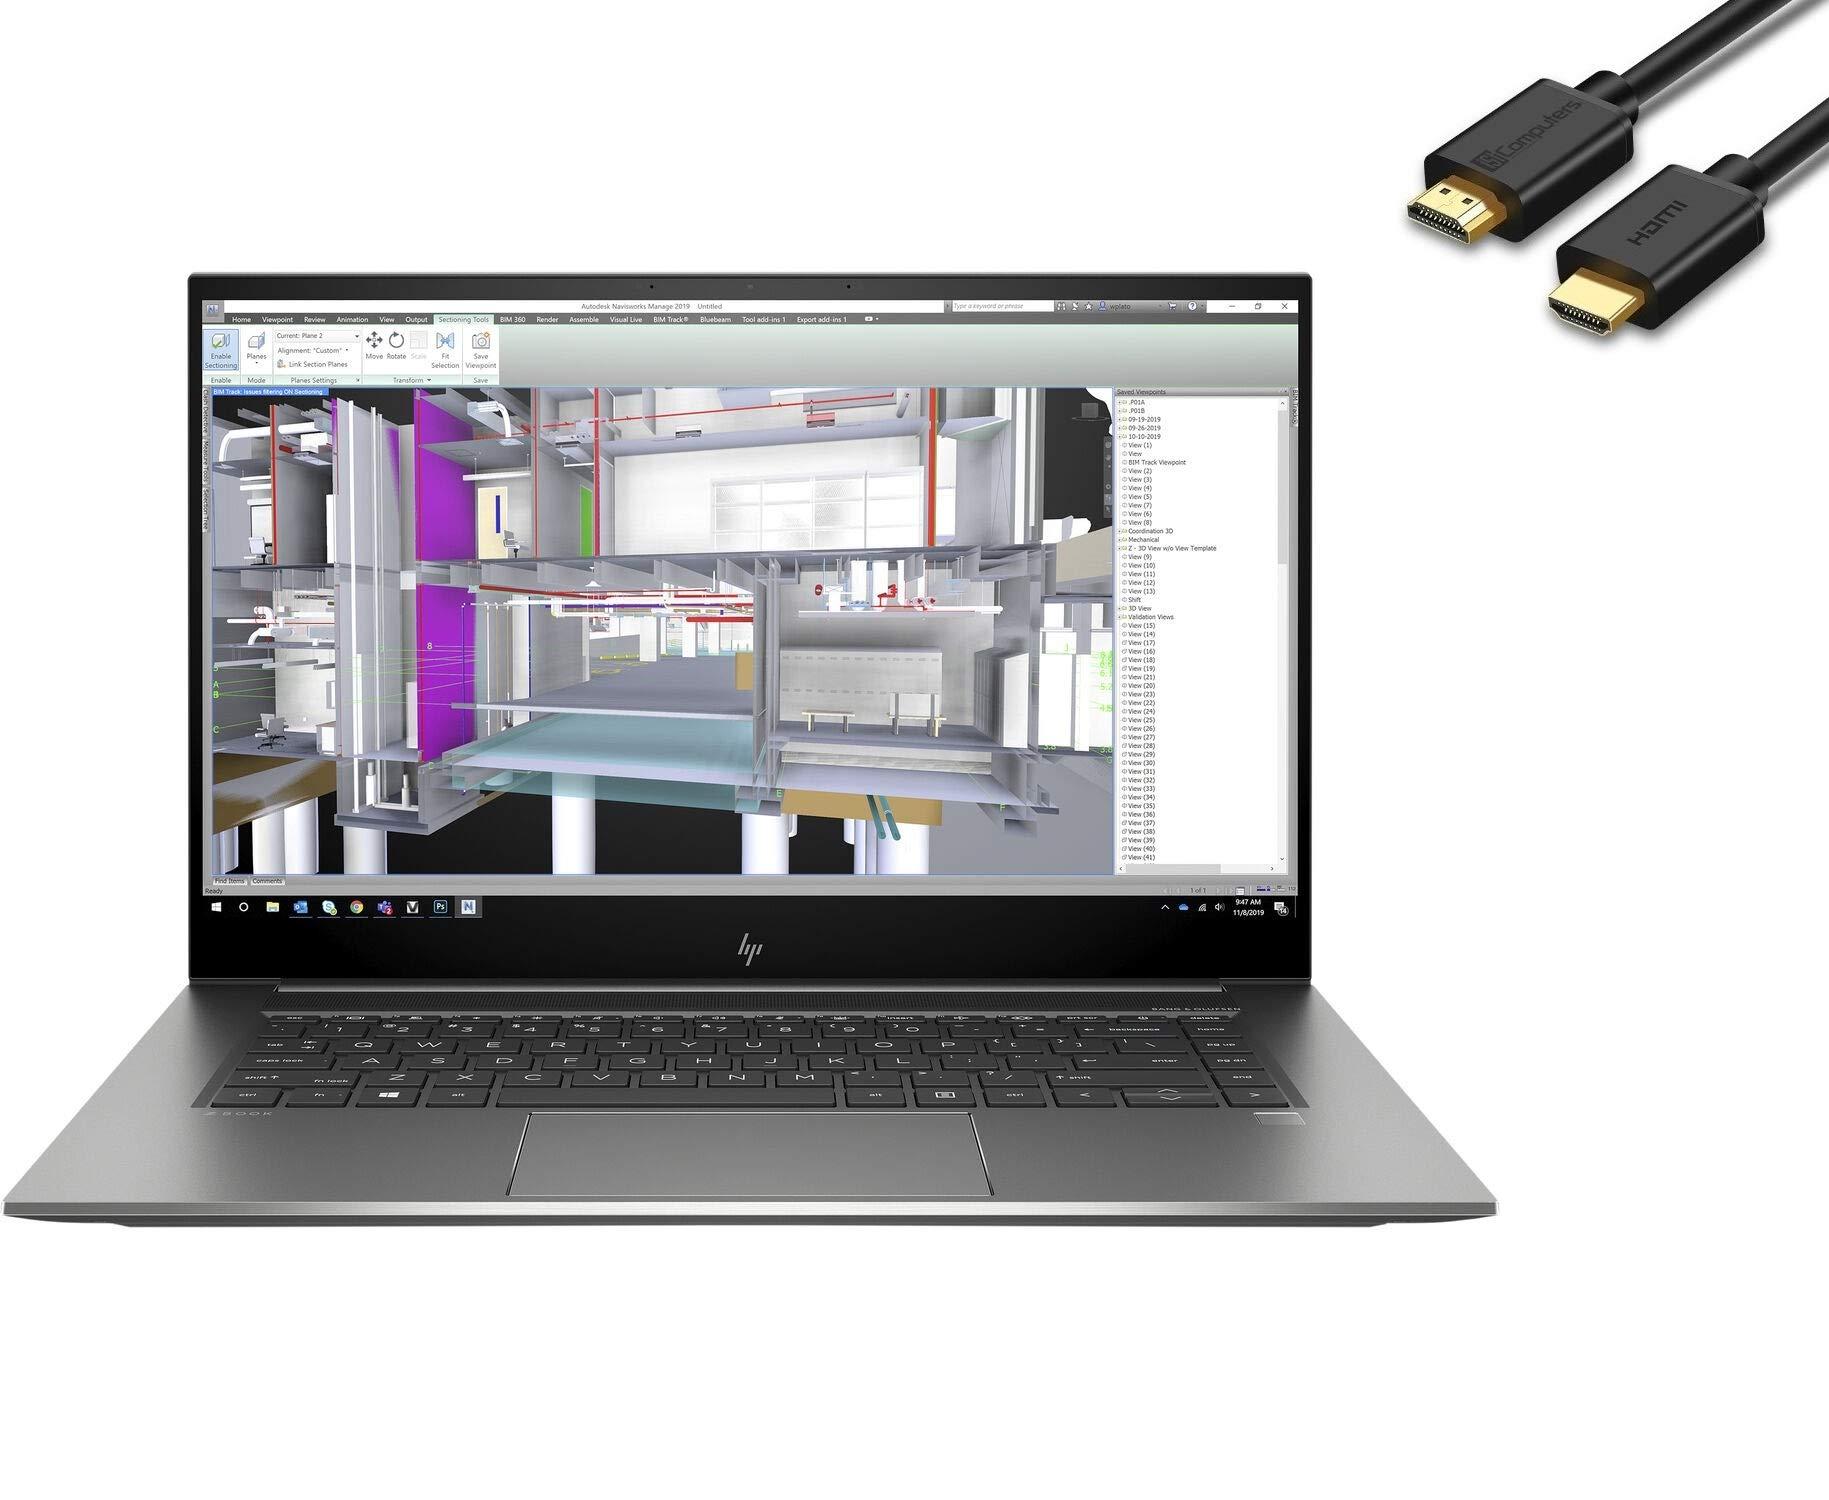 "2021 HP Zbook Studio G7 15.6"" FHD (1920x1080) Mobile Workstation Laptop (Intel 8-Core i9-10885H, 16GB DDR4 RAM, 1TB PCIe SSD, Quadro T1000 Graphics) Backlit, 2 x Thunderbolt 3, WiFi 6, Windows 10 Pro"